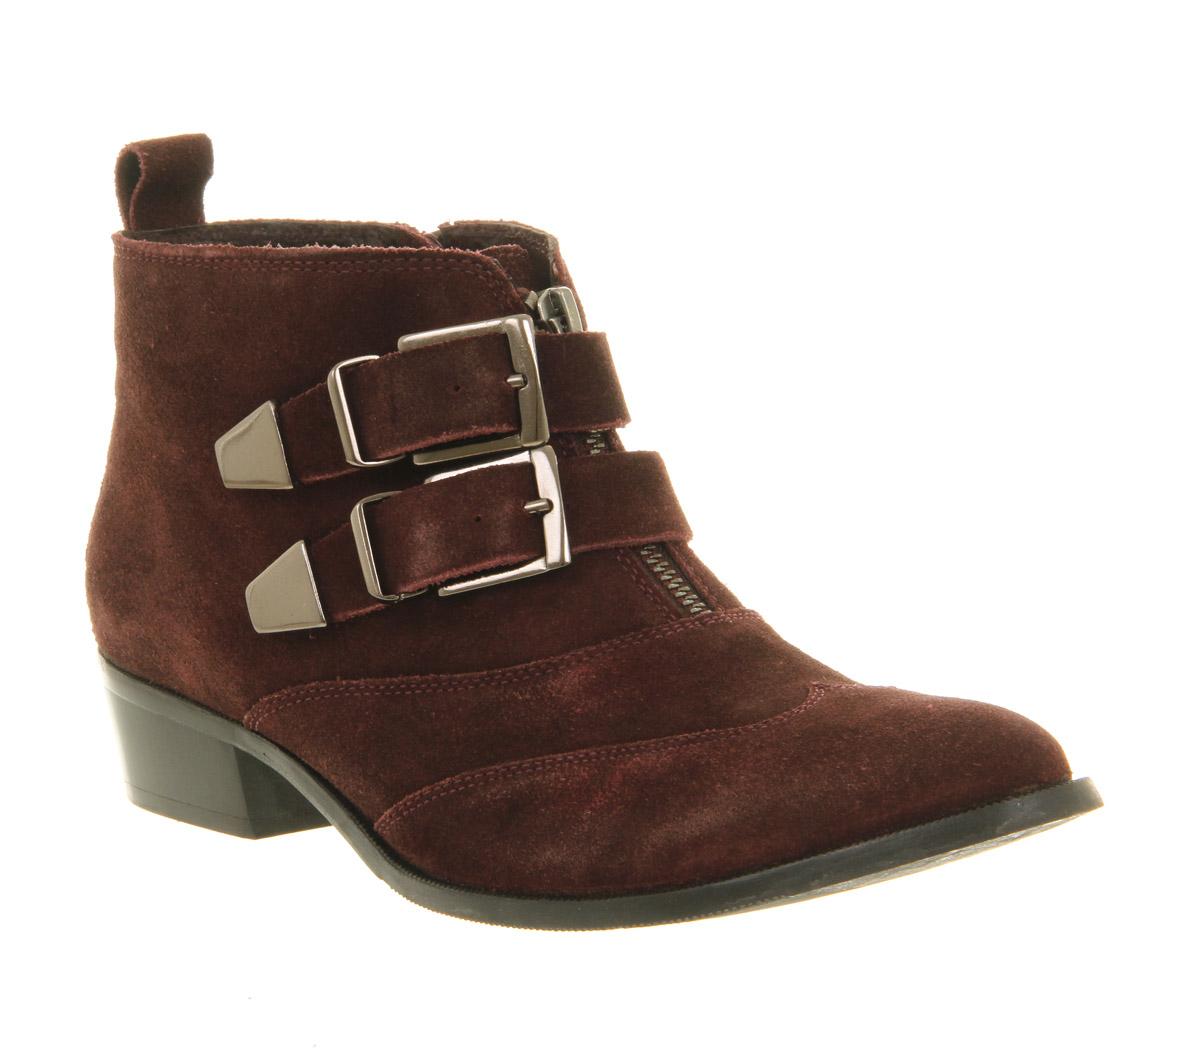 Clothes, Shoes & Accessories > Women's Shoes > Boots